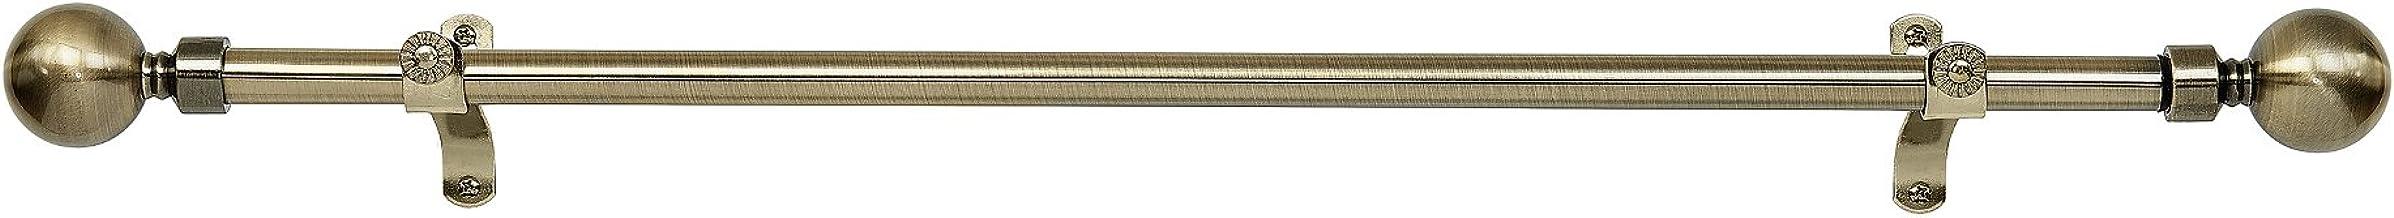 "Achim Home Meubels Metallo Decoratieve Gordijn Rod & Finial, Lincoln, 28"" x 48"""